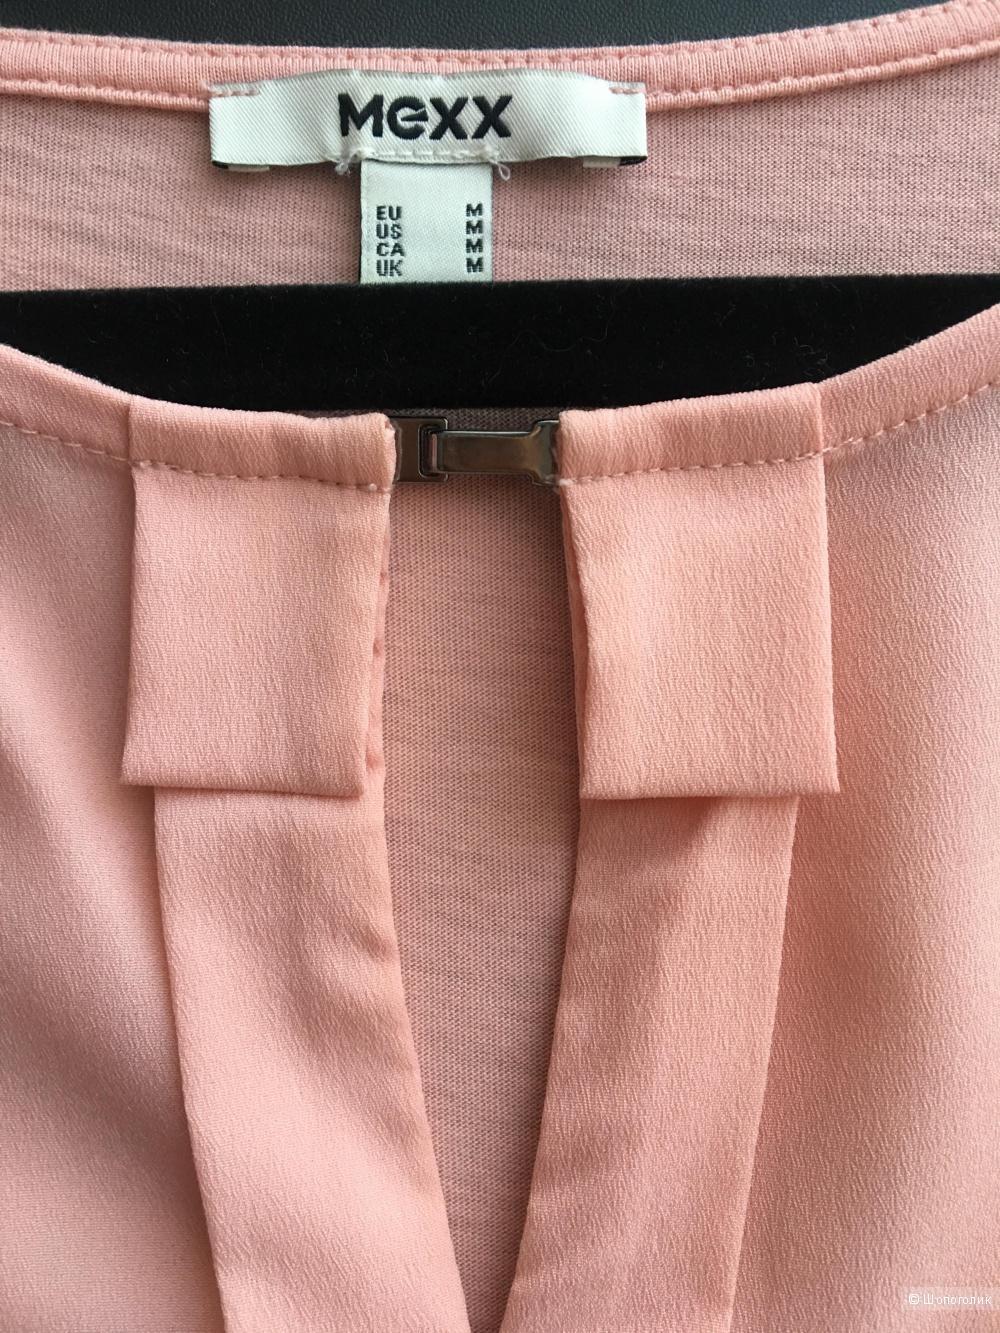 Блузка Mexx, размер 46-48.